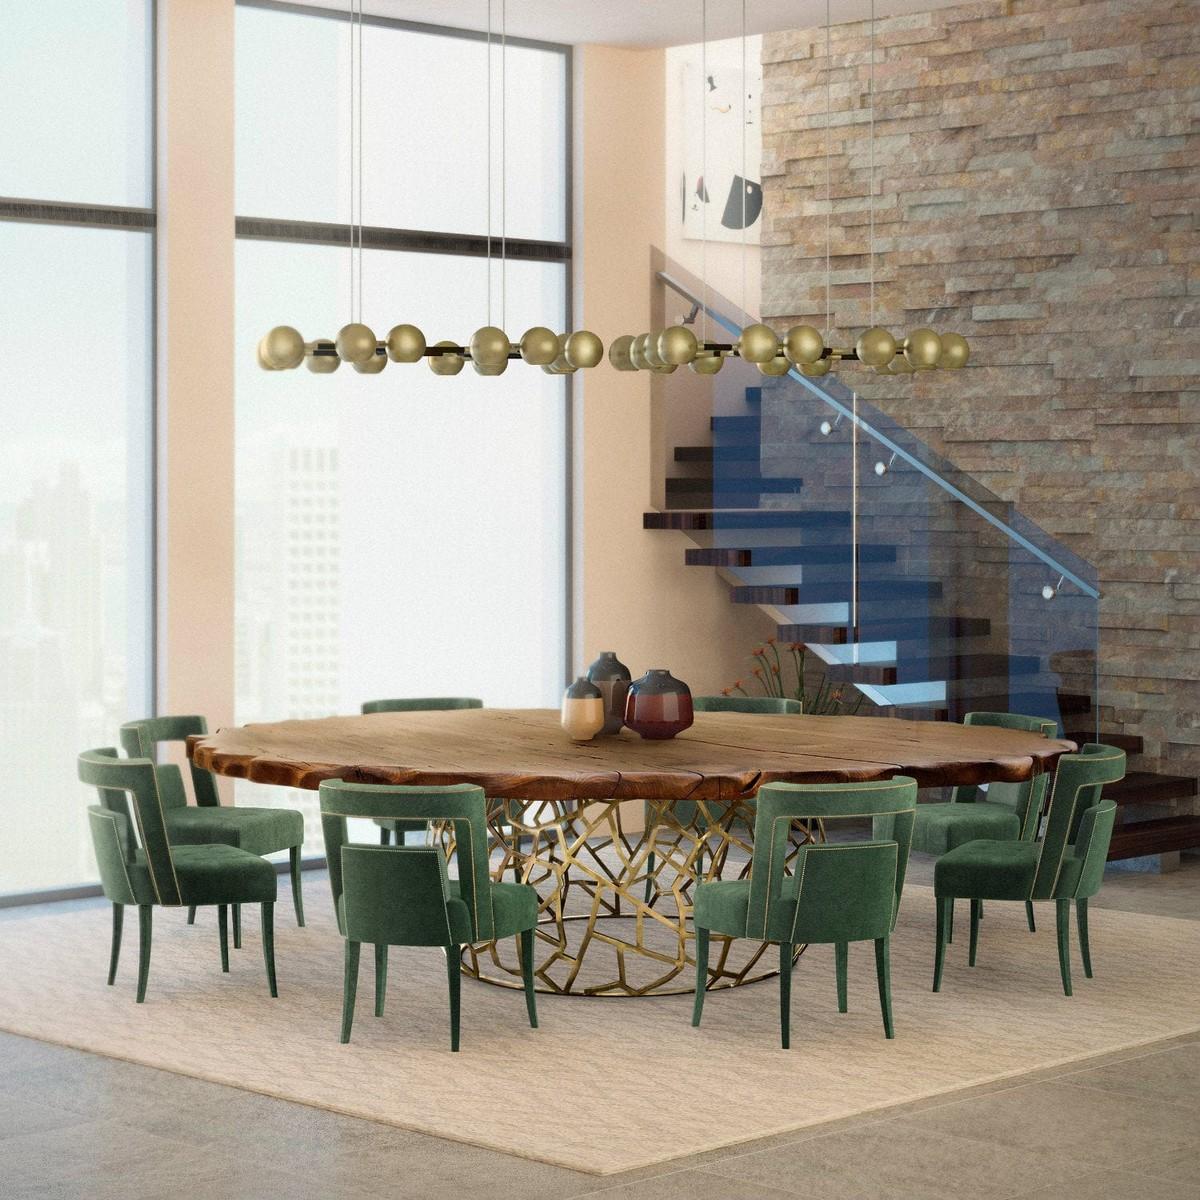 Top Bespoke Dining Tables bespoke dining tables Top Bespoke Dining Tables apis2